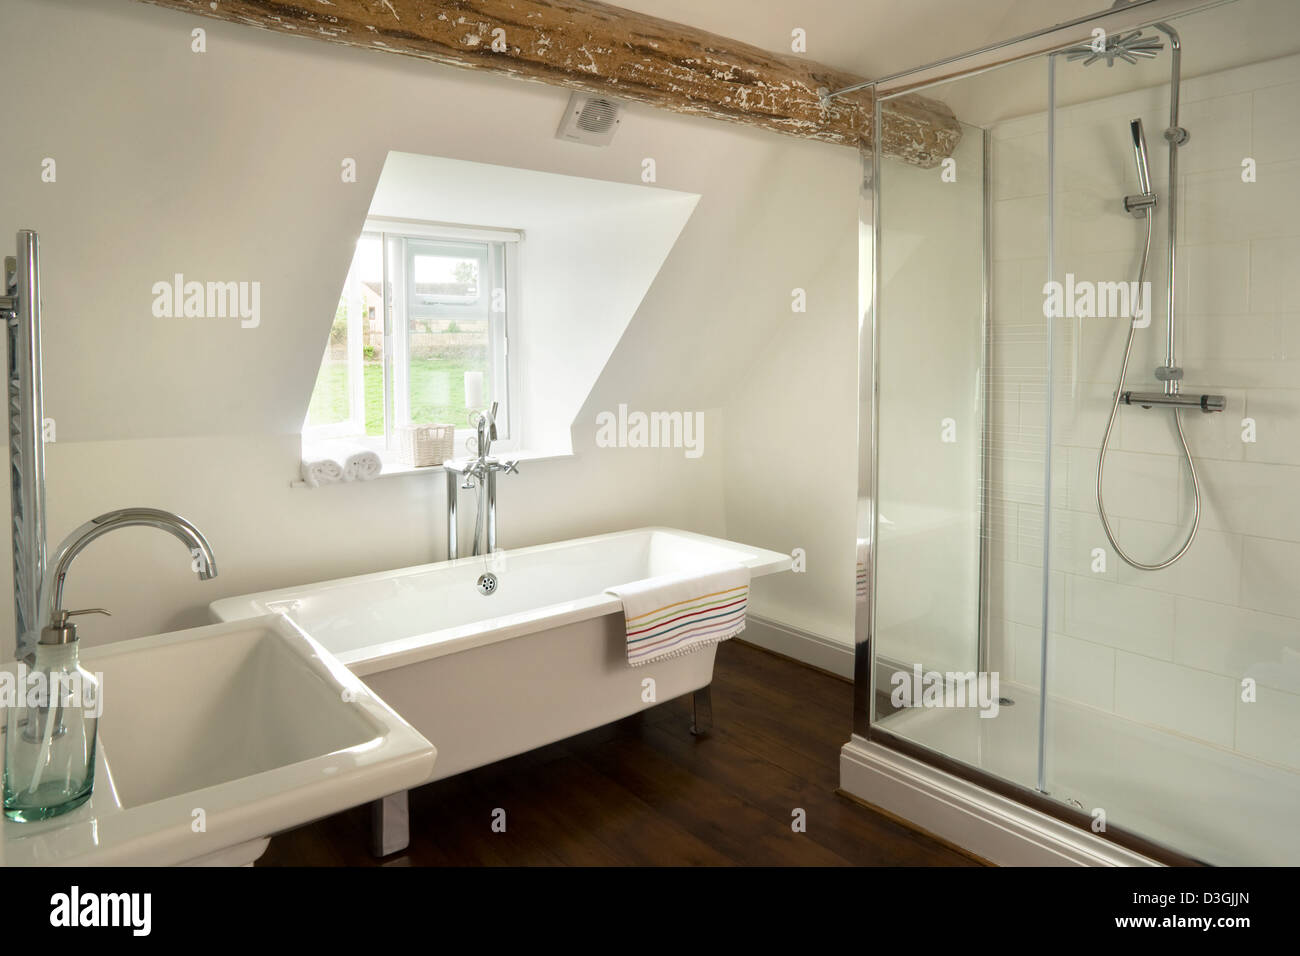 contemporary bathroom with a modern pedestal bath and large built contemporary bathroom with a modern pedestal bath and large built in shower in an attic room